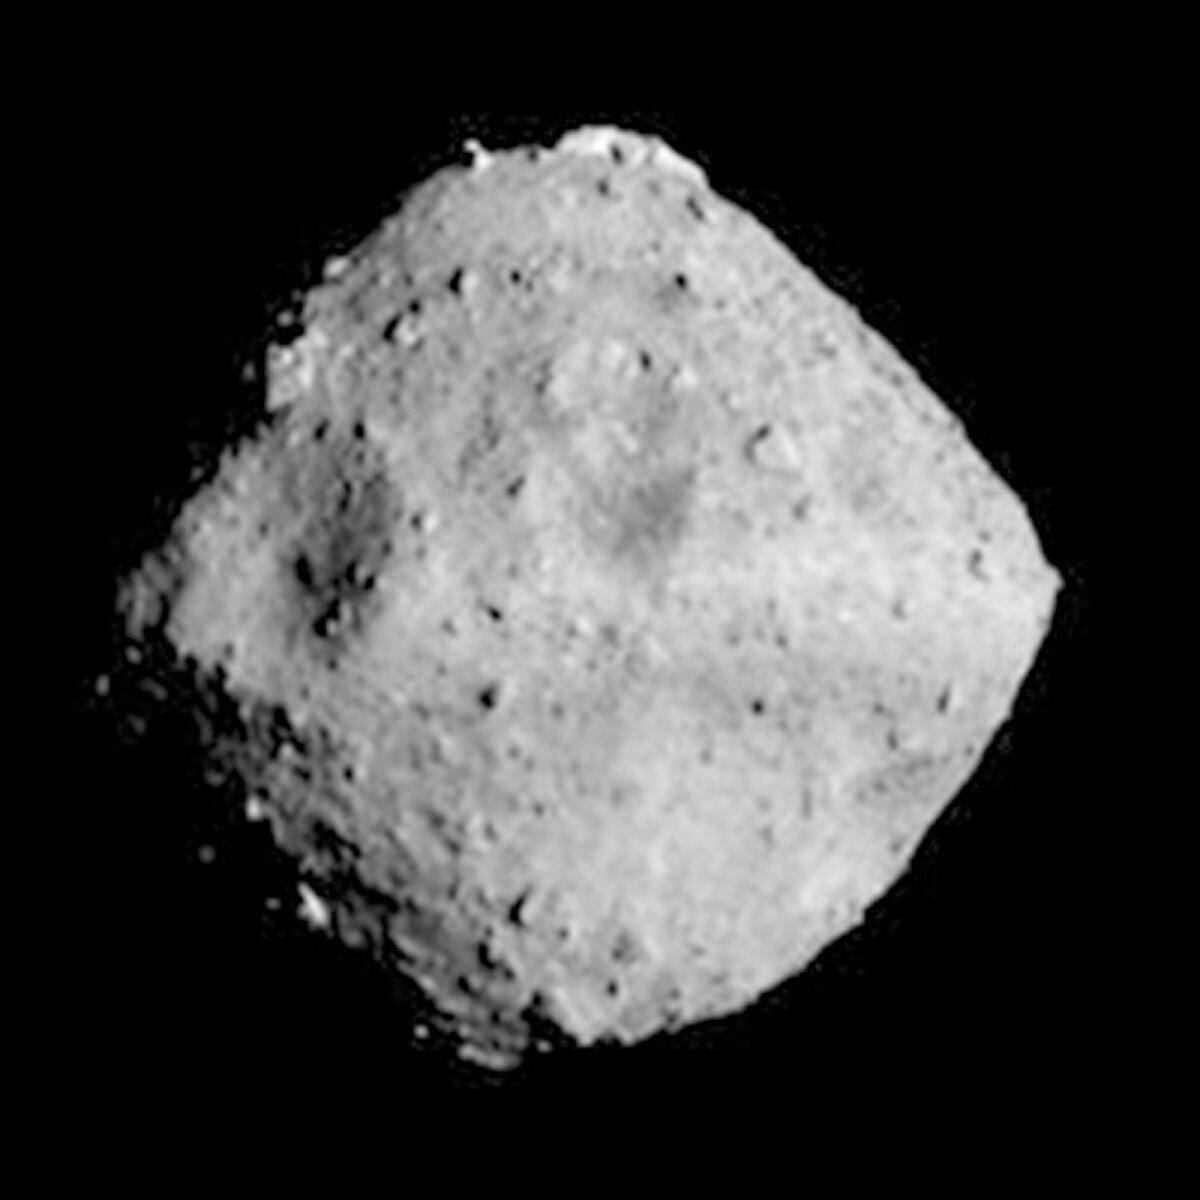 Asteroid Ryugu.